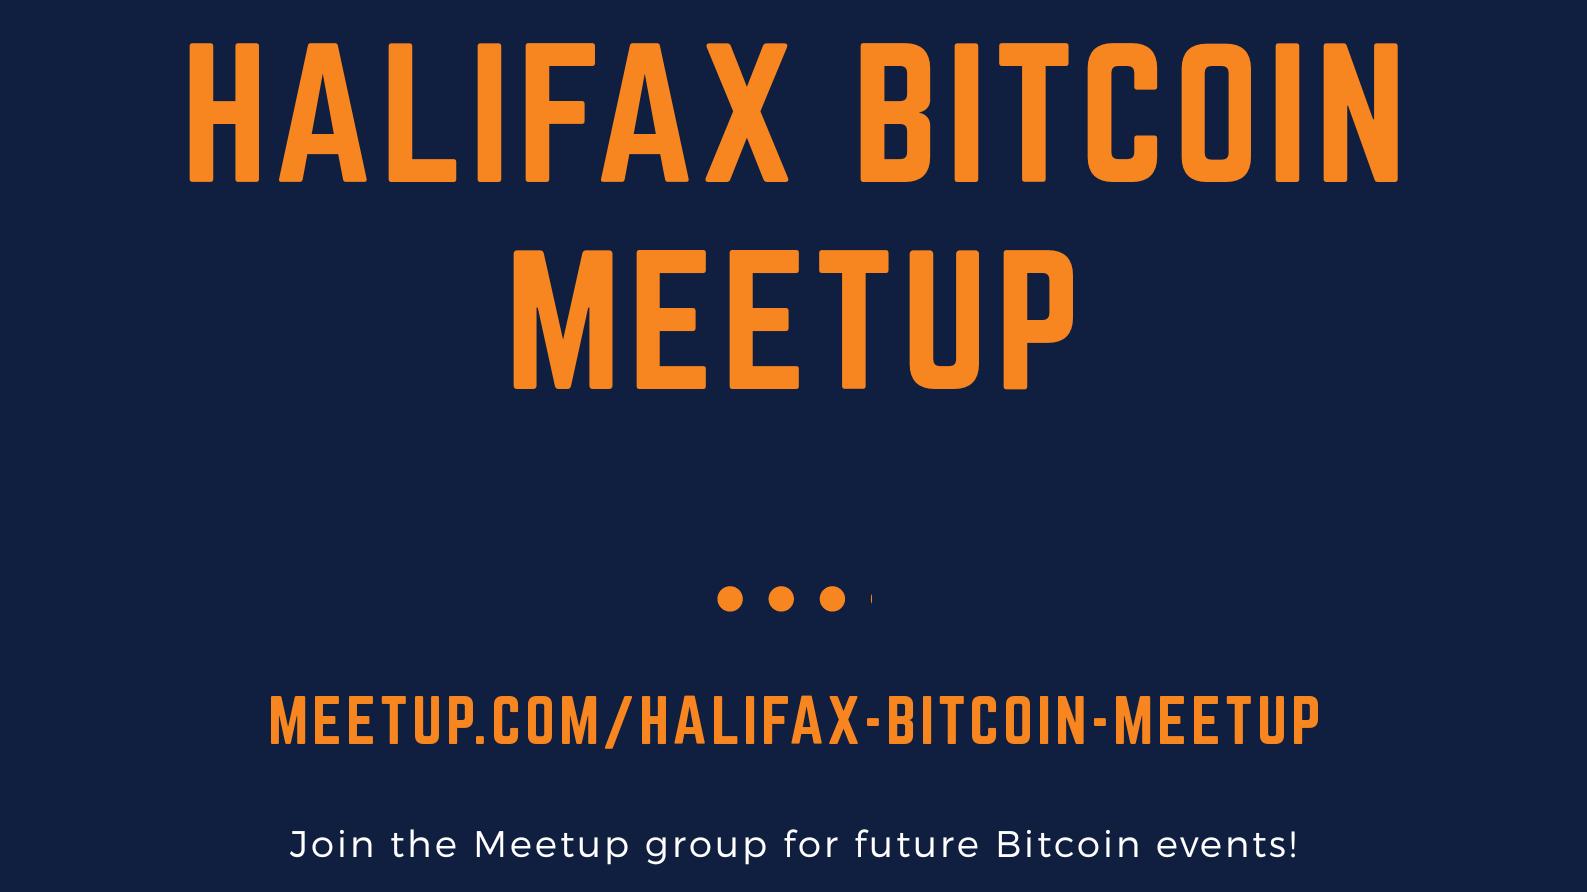 Halifax Bitcoin Meetup